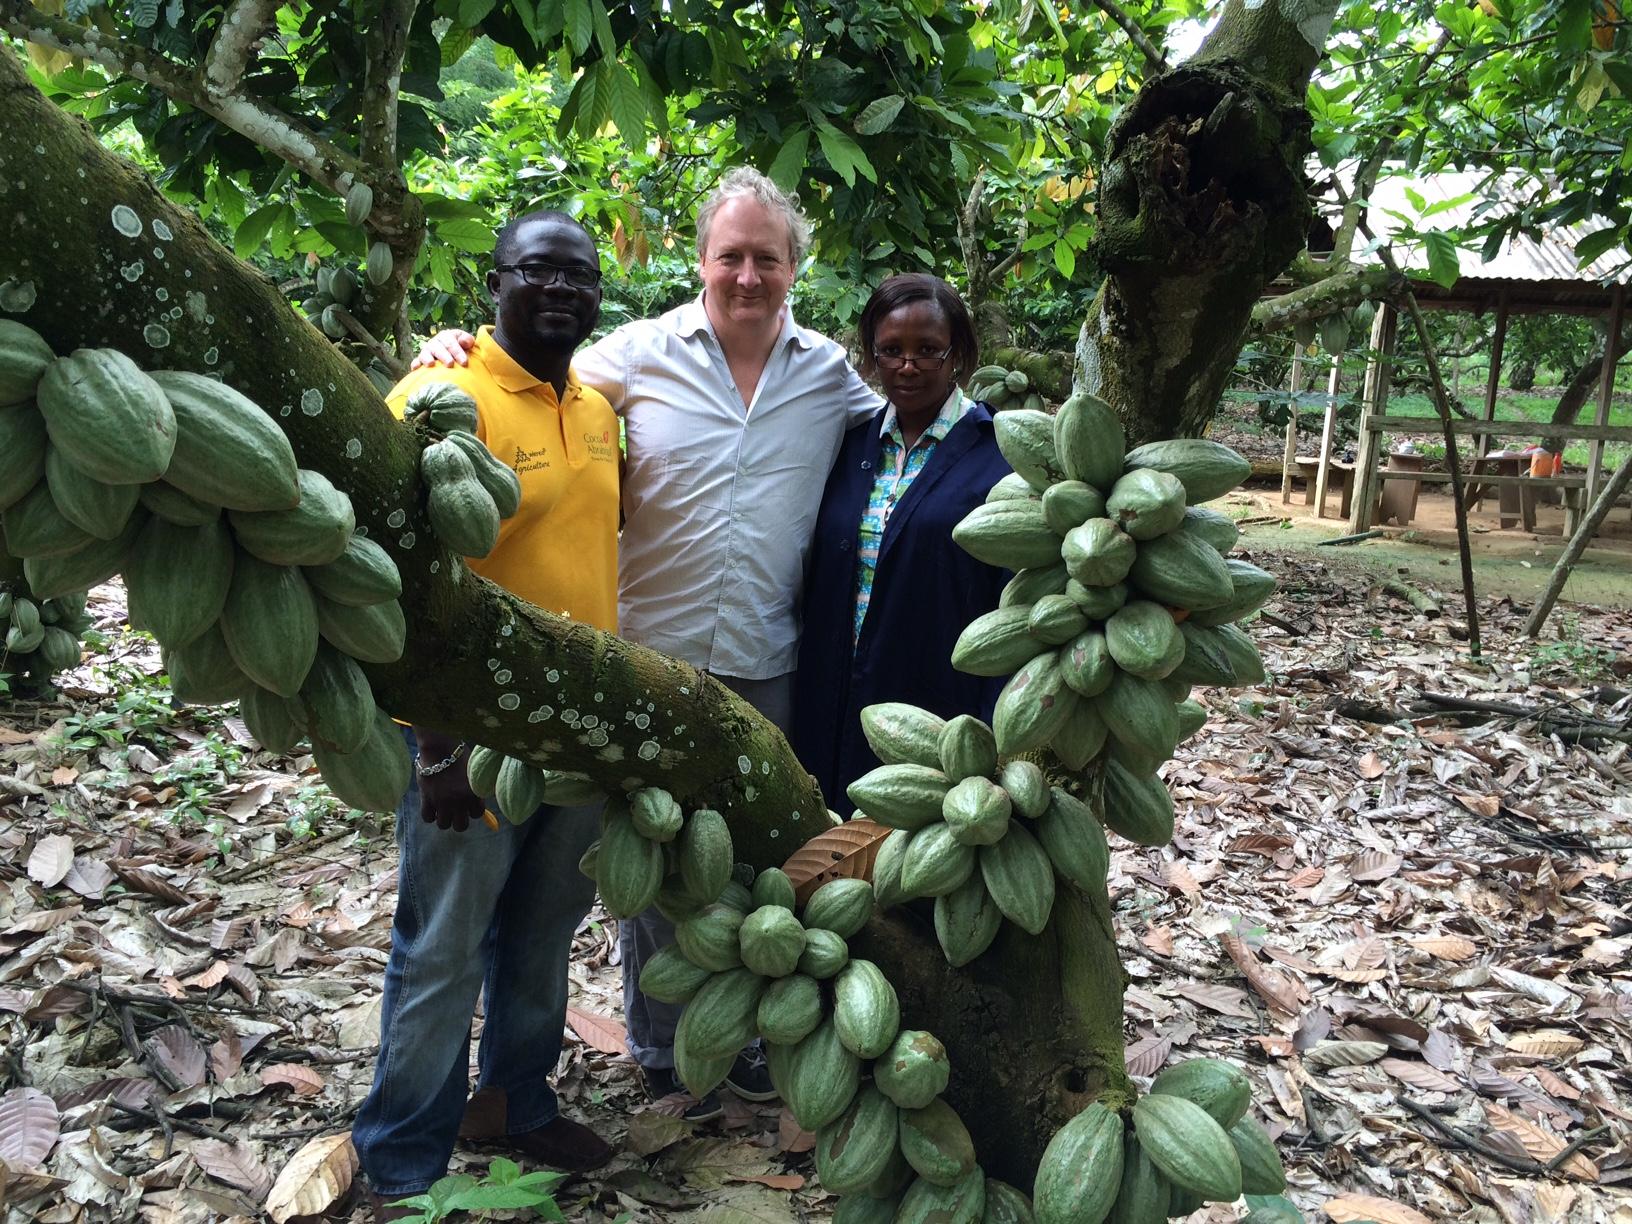 Cocoa Farming In Africa